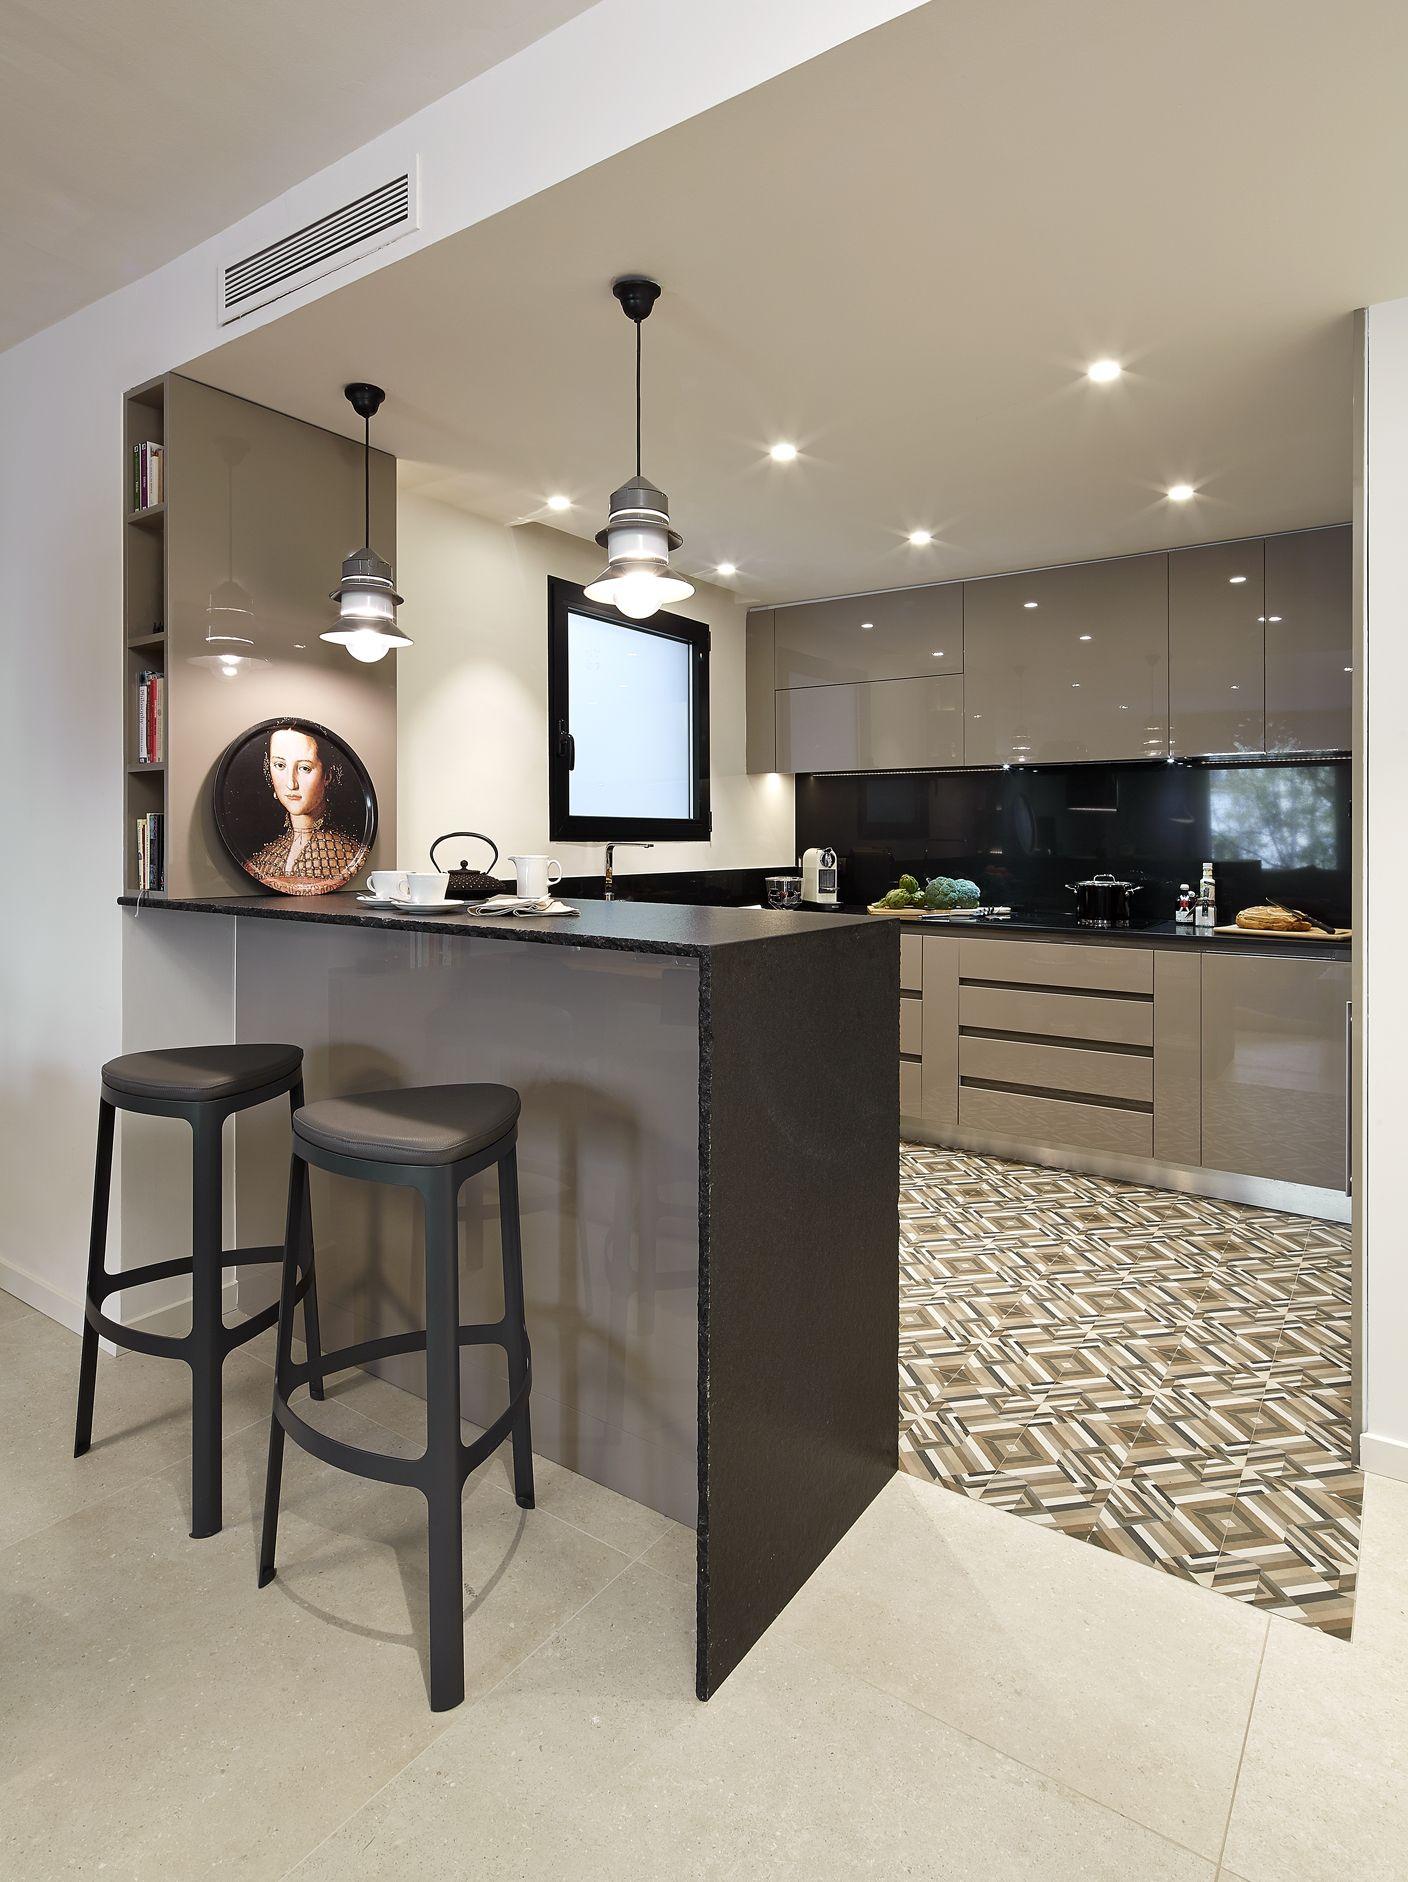 Molins interiors arquitectura interior interiorismo for Comedor con taburetes